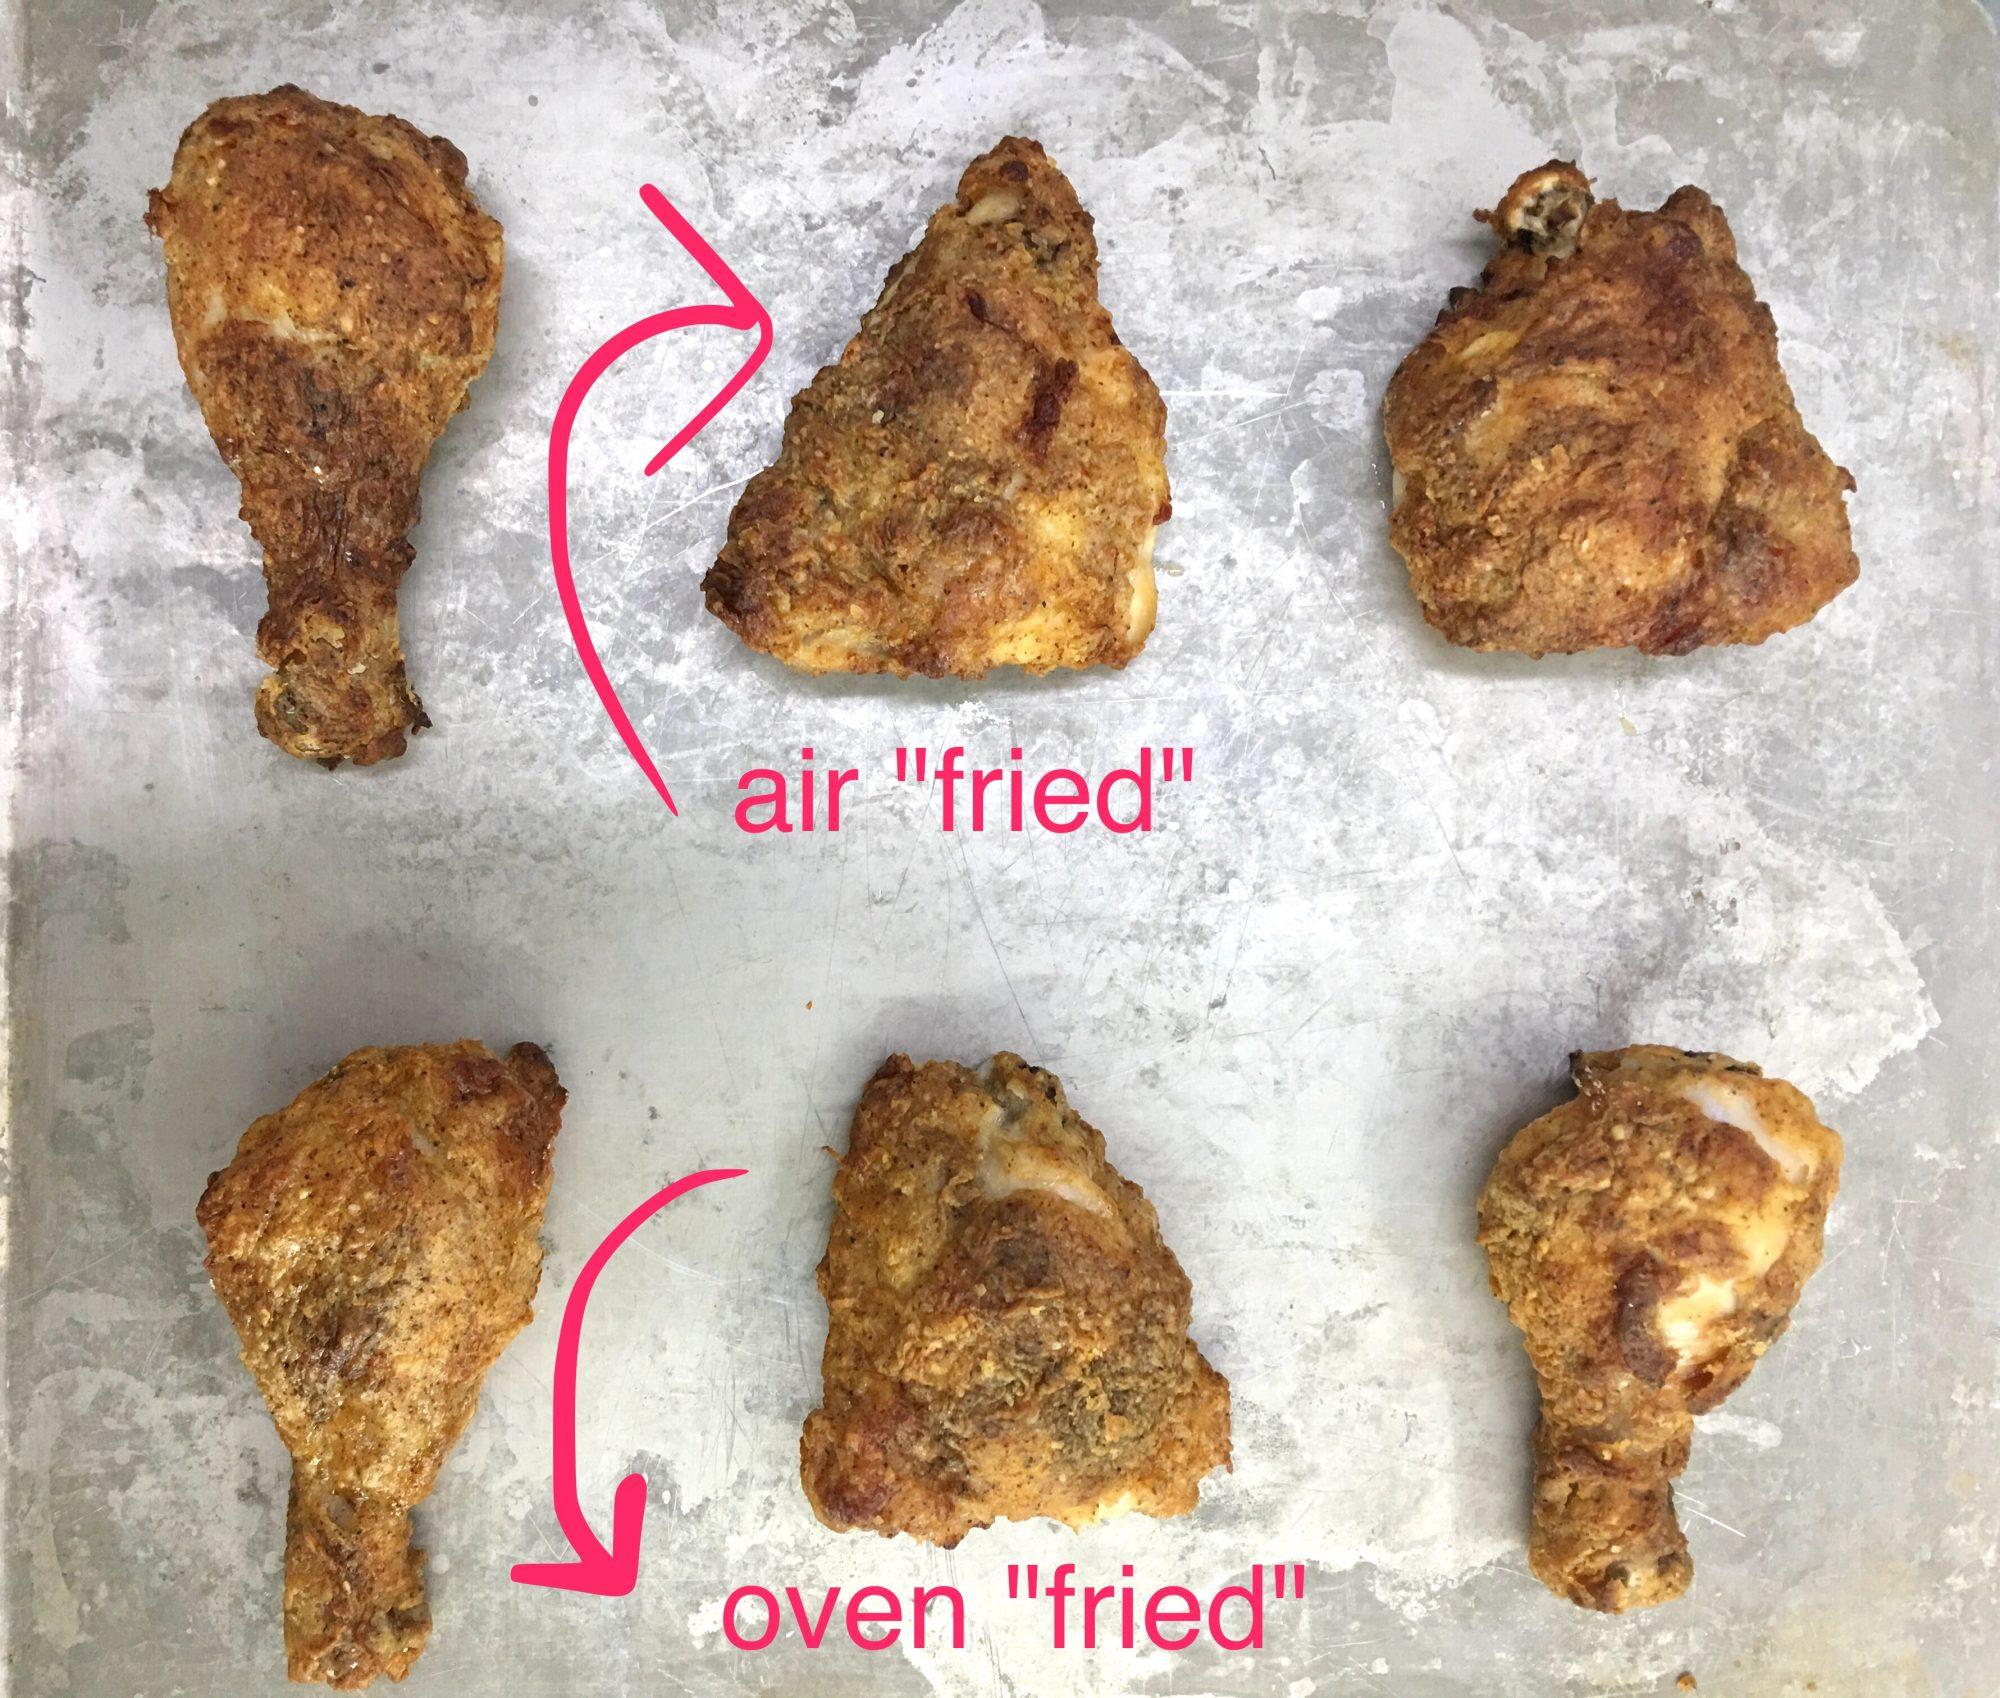 oven-fried-chicken-test.jpeg